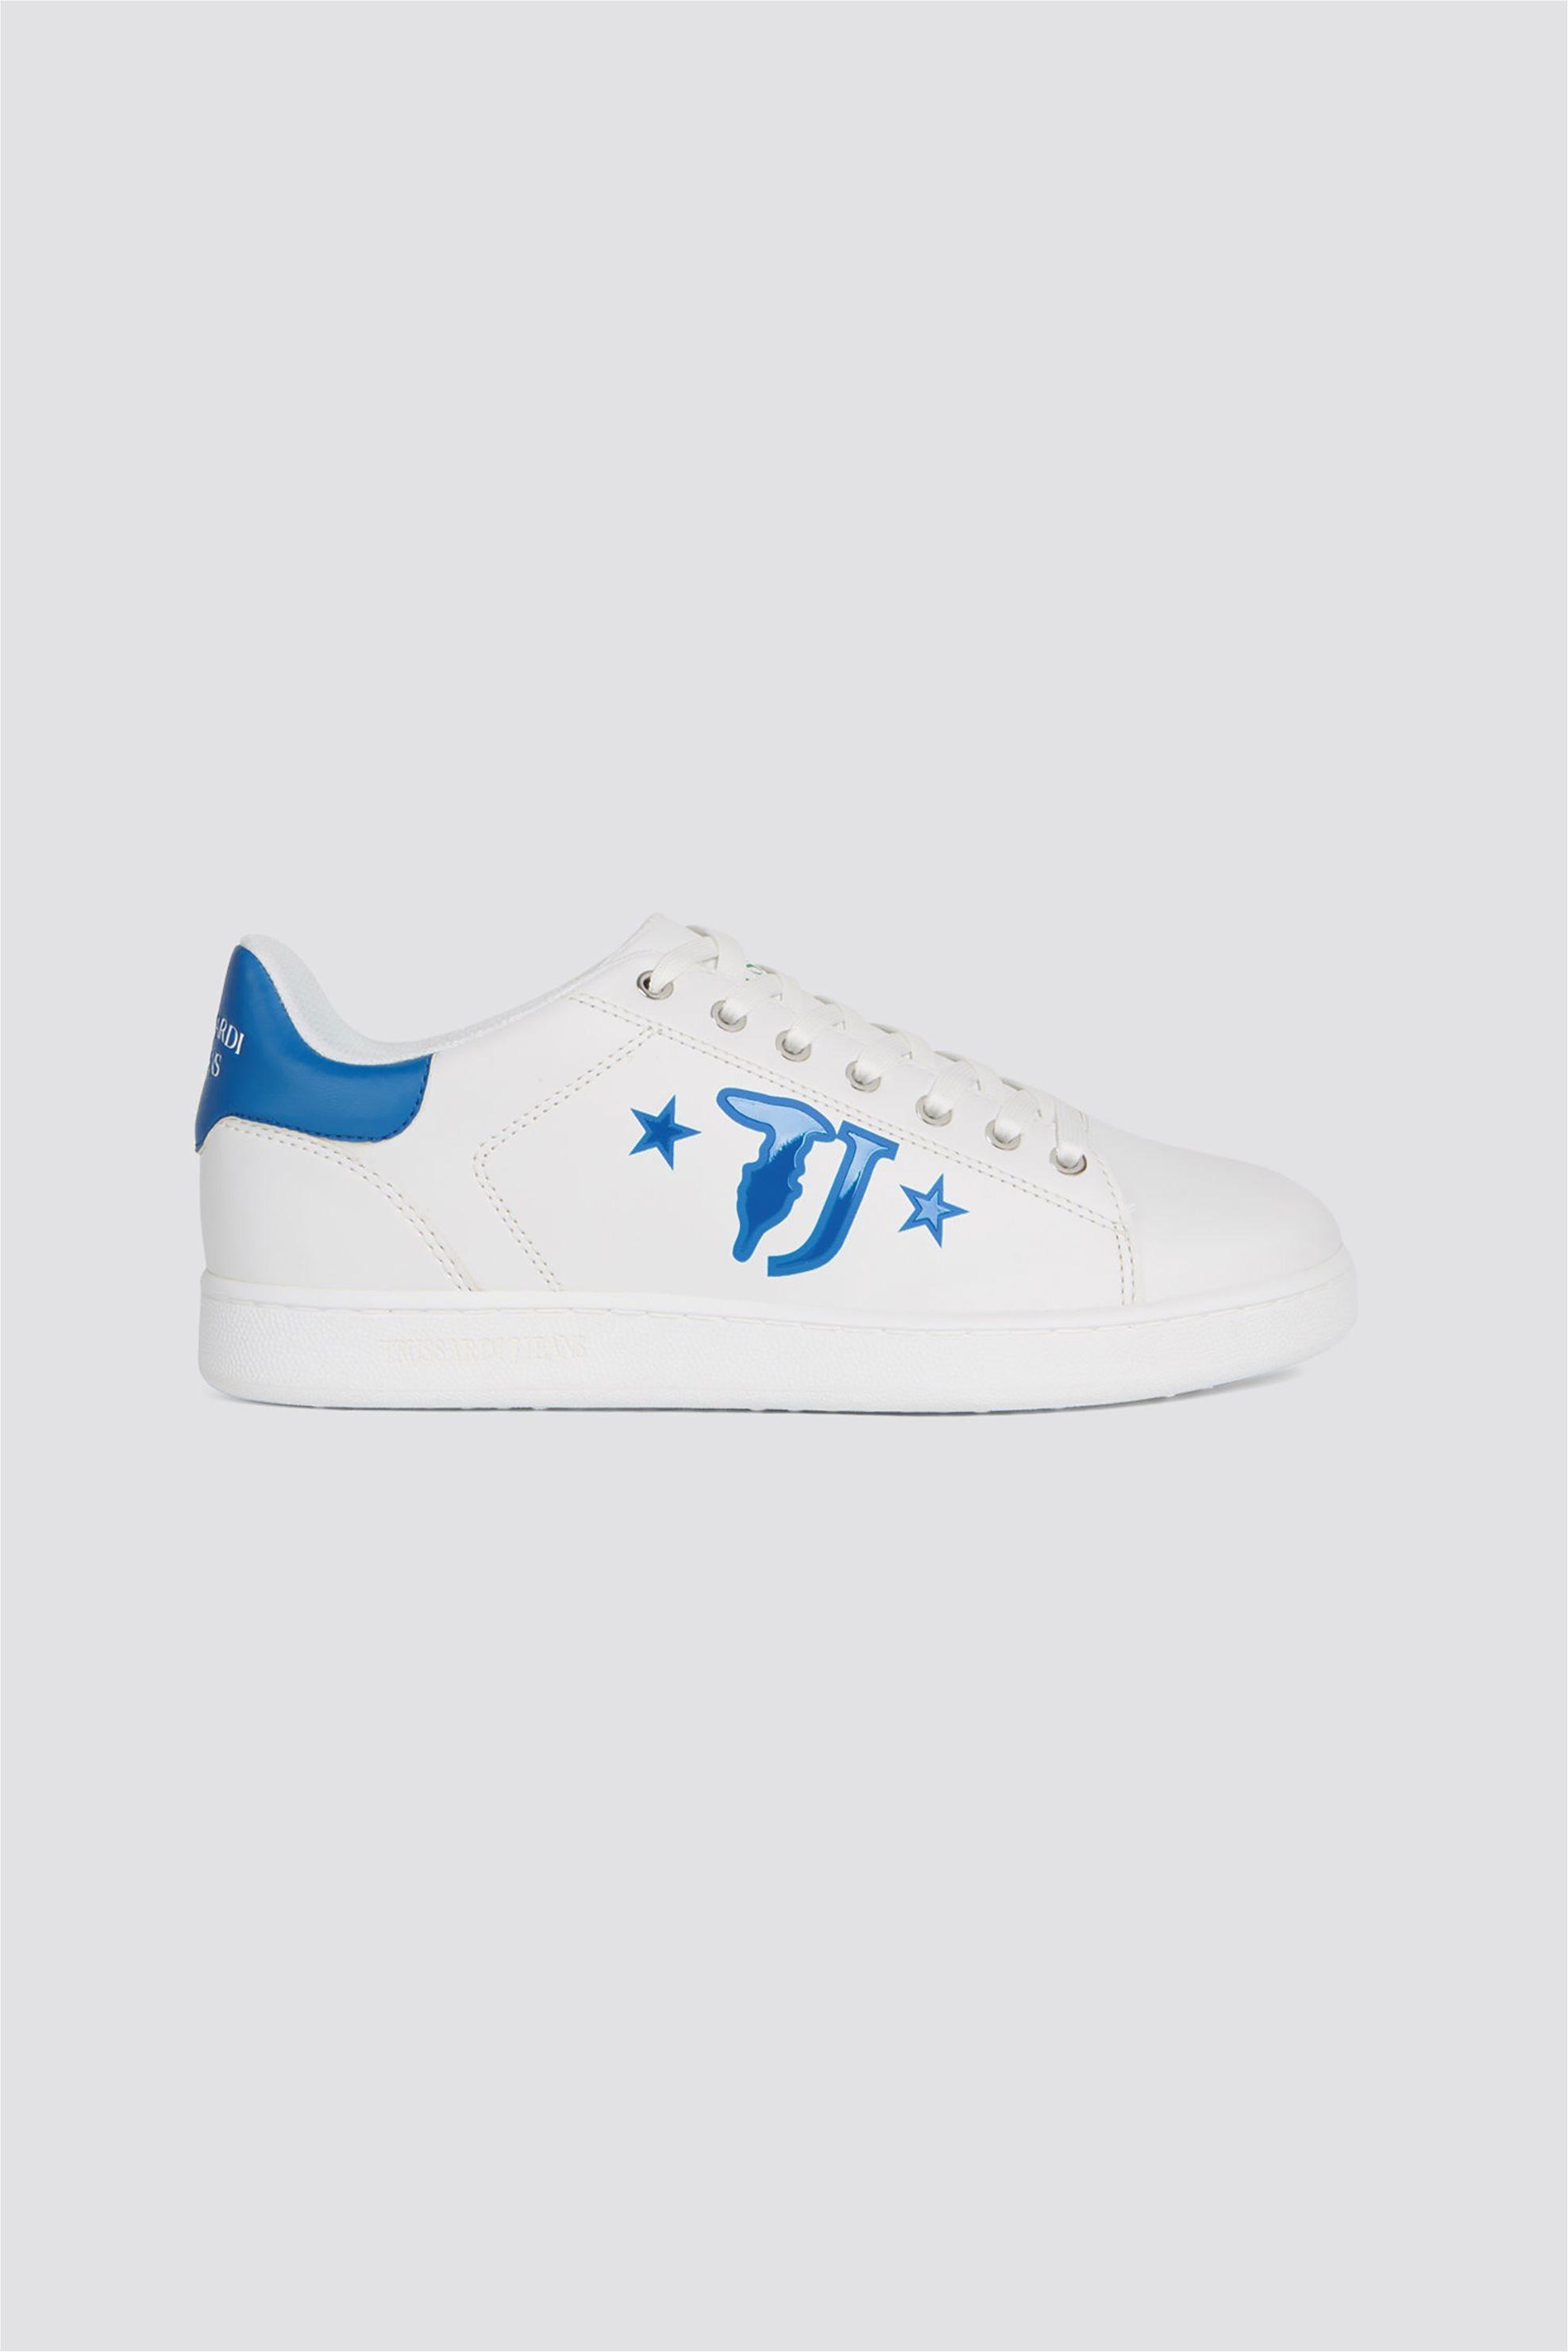 45f0ff426ad Notos Trussardi ανδρικά sneakers με brand logo print στο πλάι –  77A00173-9Y099999 – Γαλάζιο